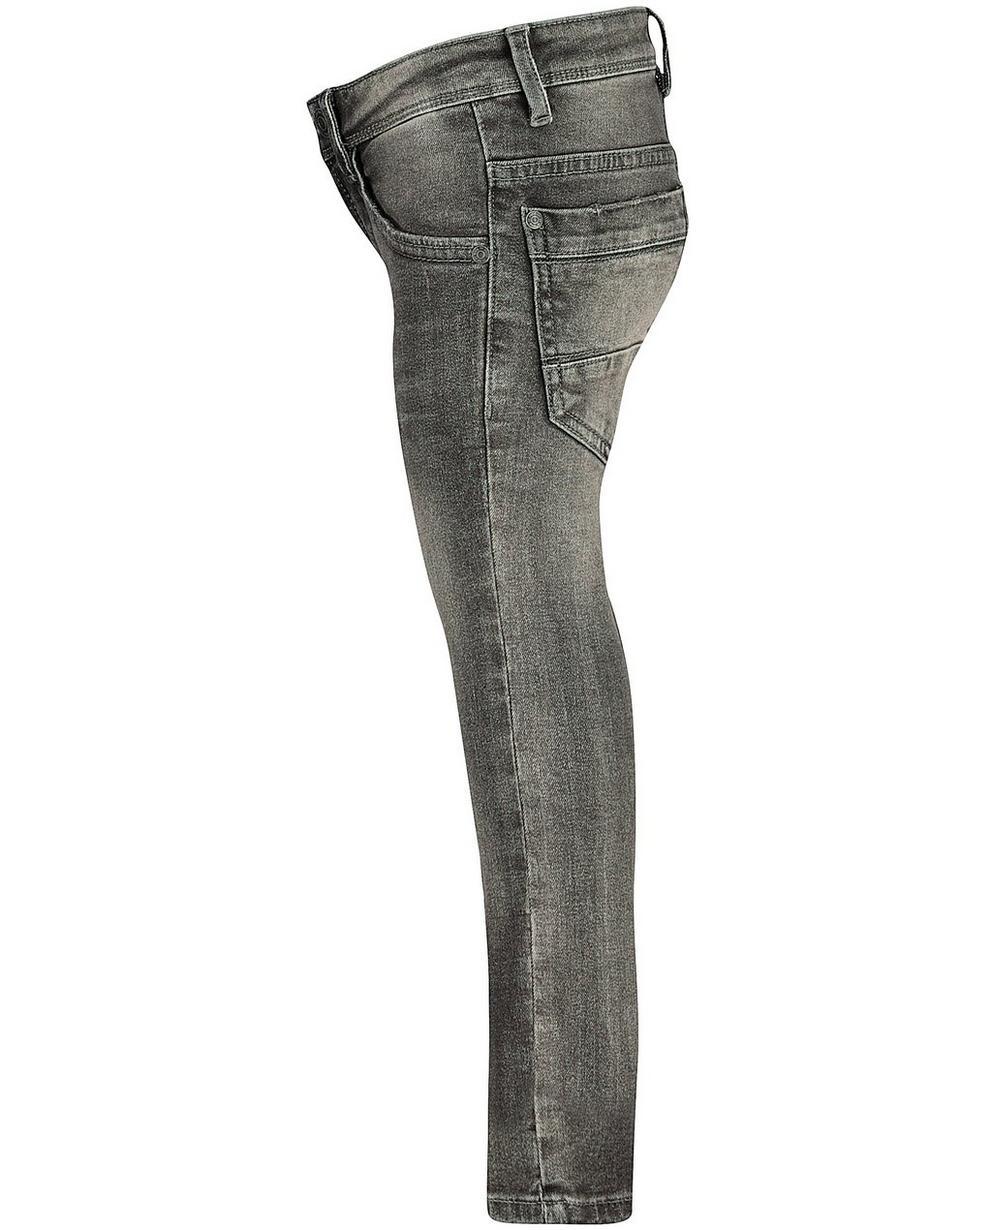 Jeans - Grau - Skinny Straight Jeans THOMAS